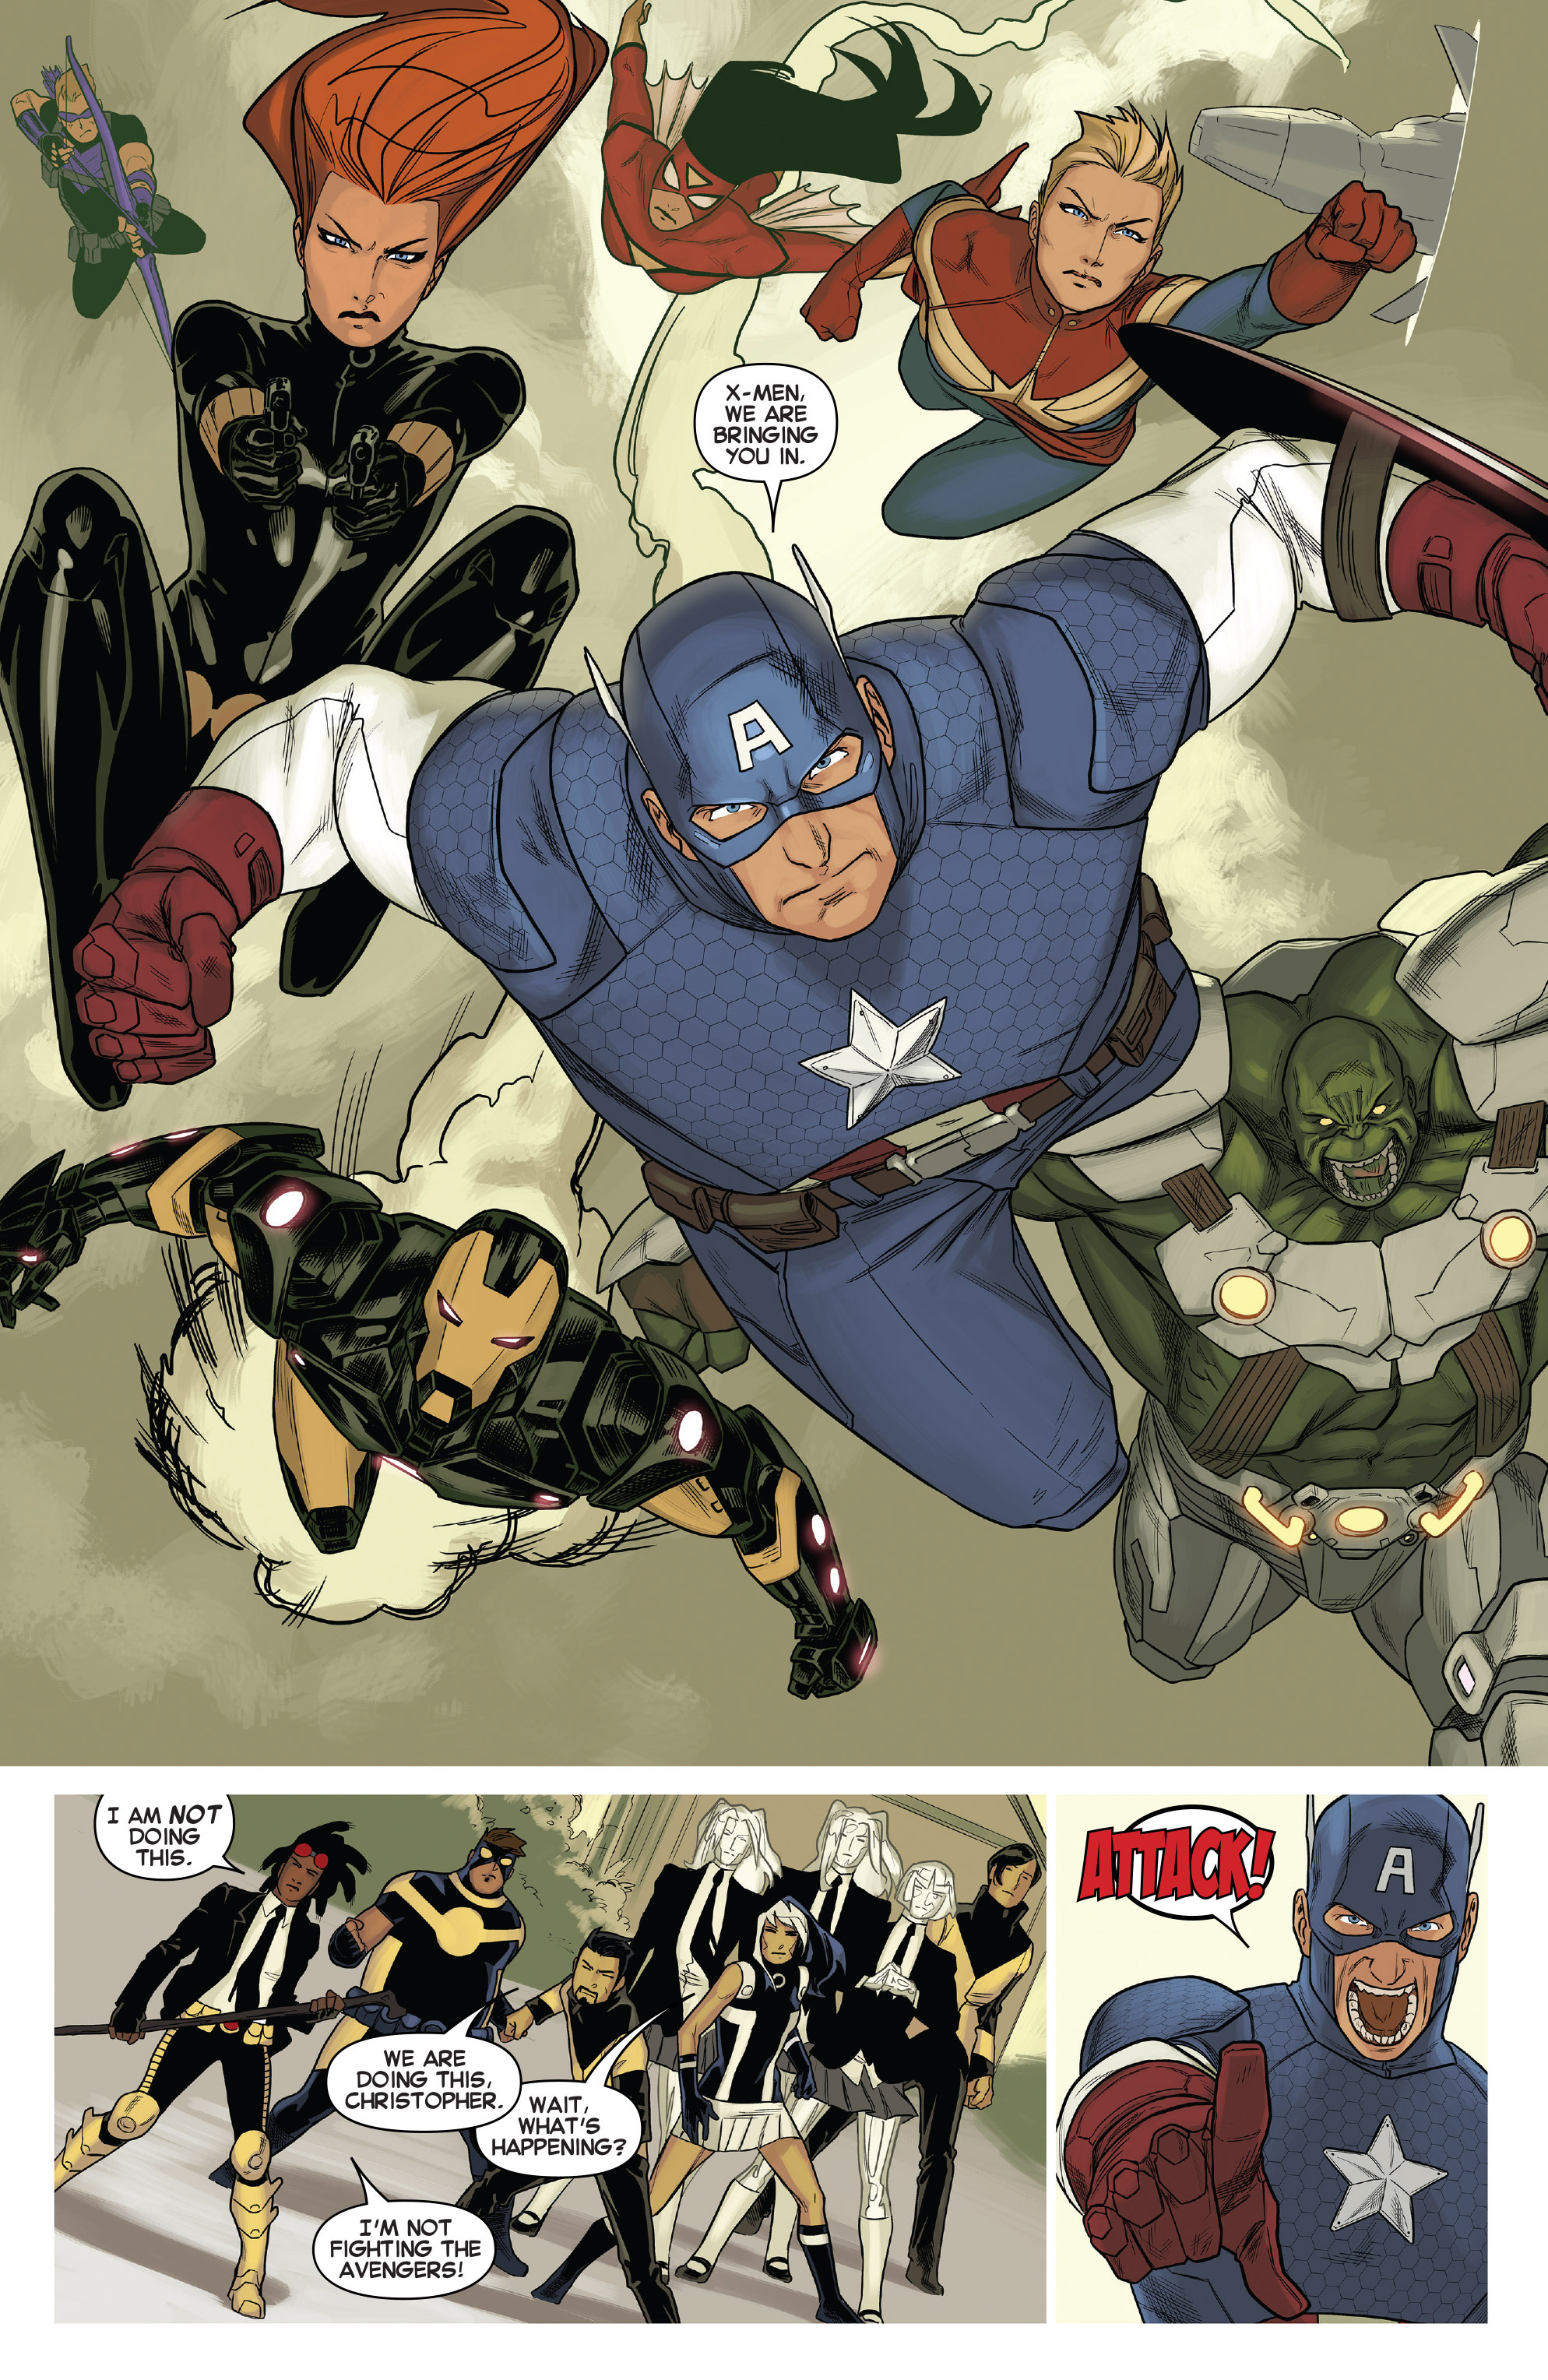 Read online Uncanny X-Men (2013) comic -  Issue # _TPB 5 - The Omega Mutant - 13